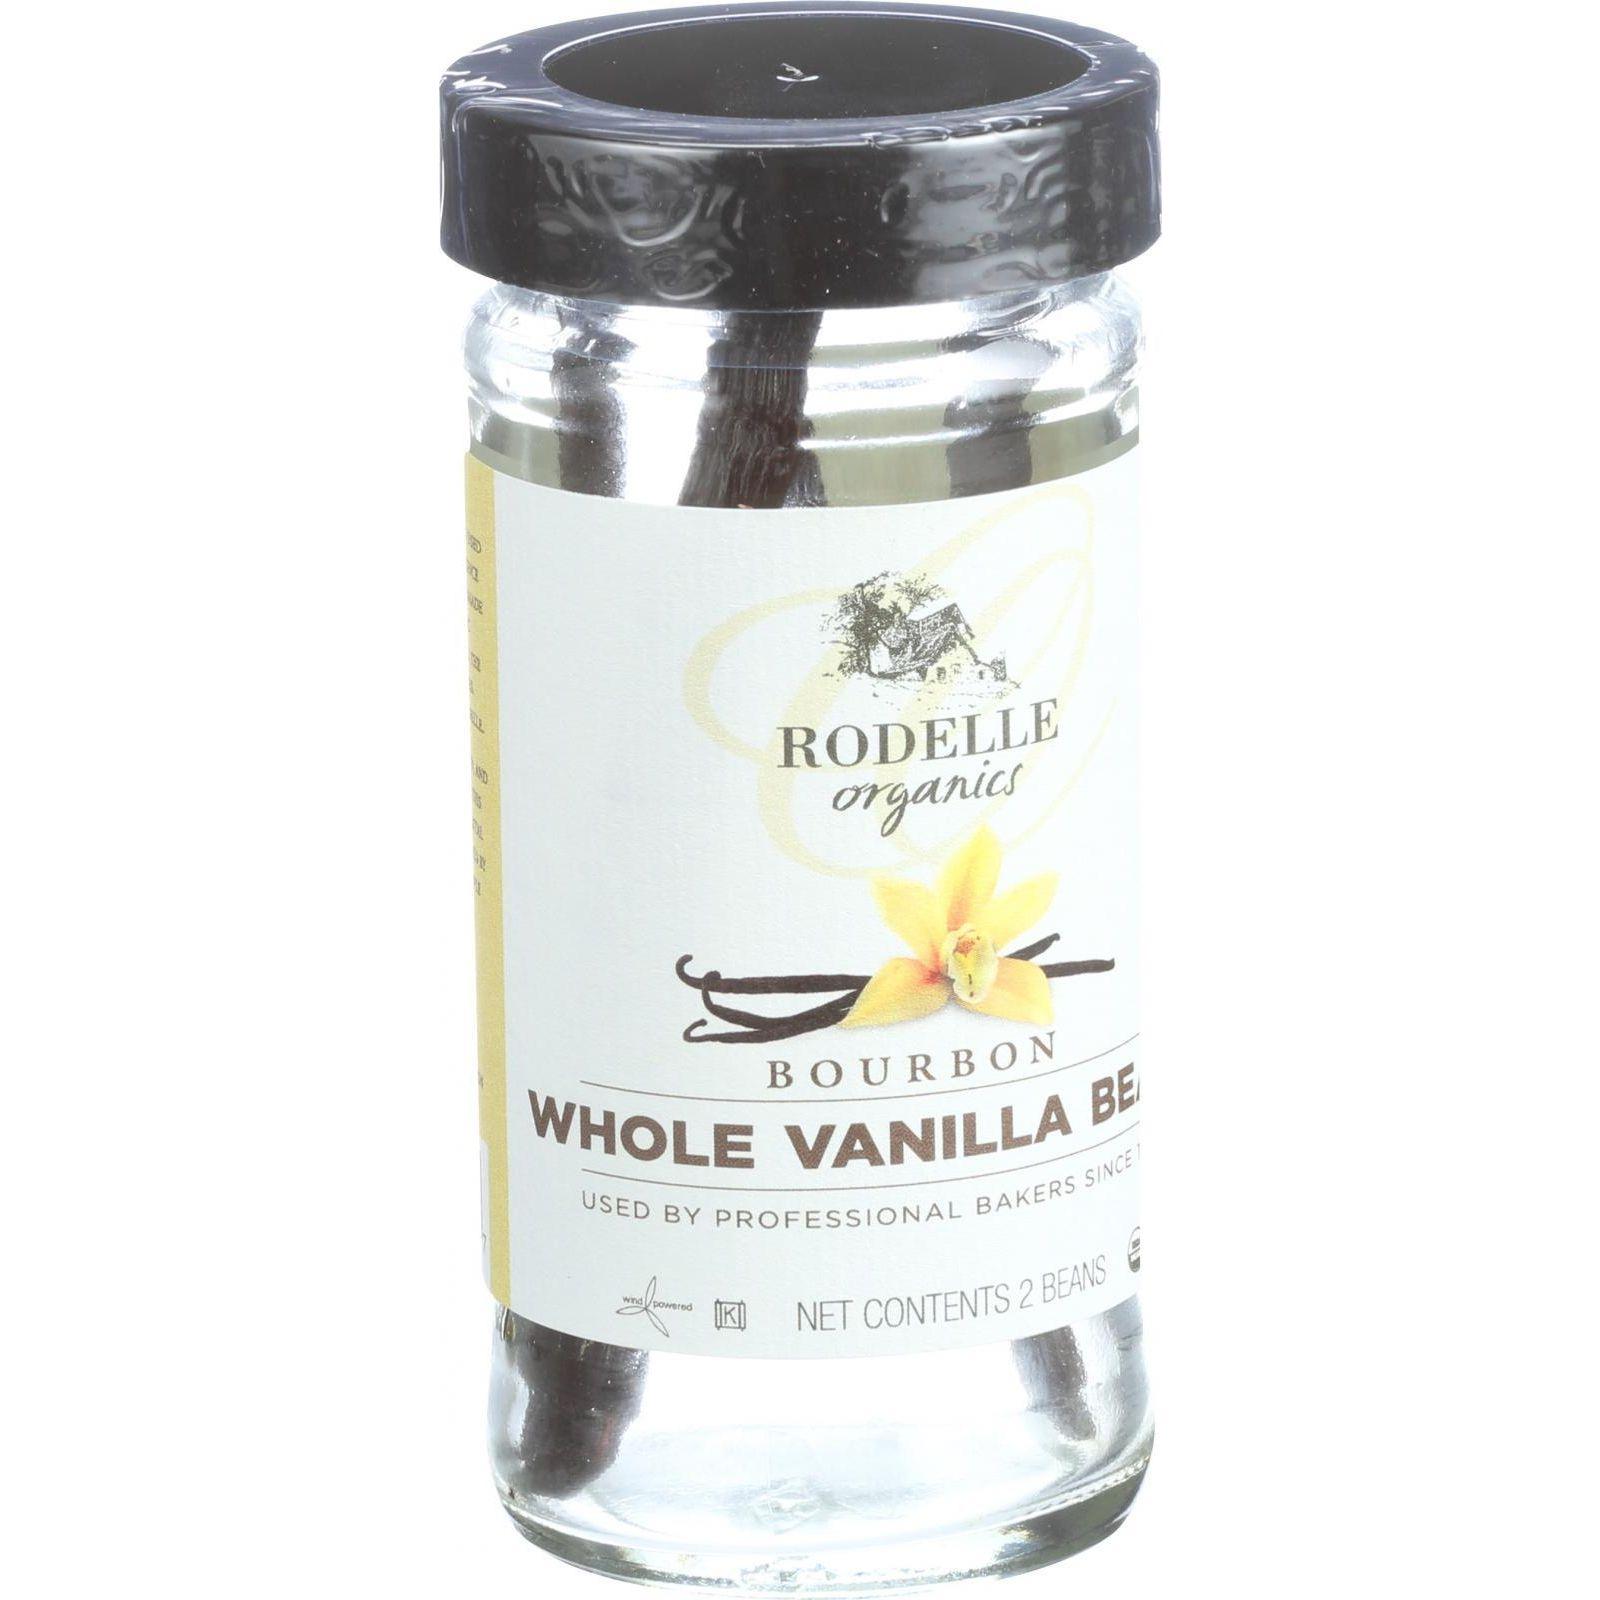 Rodelle Organic Vanilla Beans - Whole - Bourbon - 2 Count - Case of 6